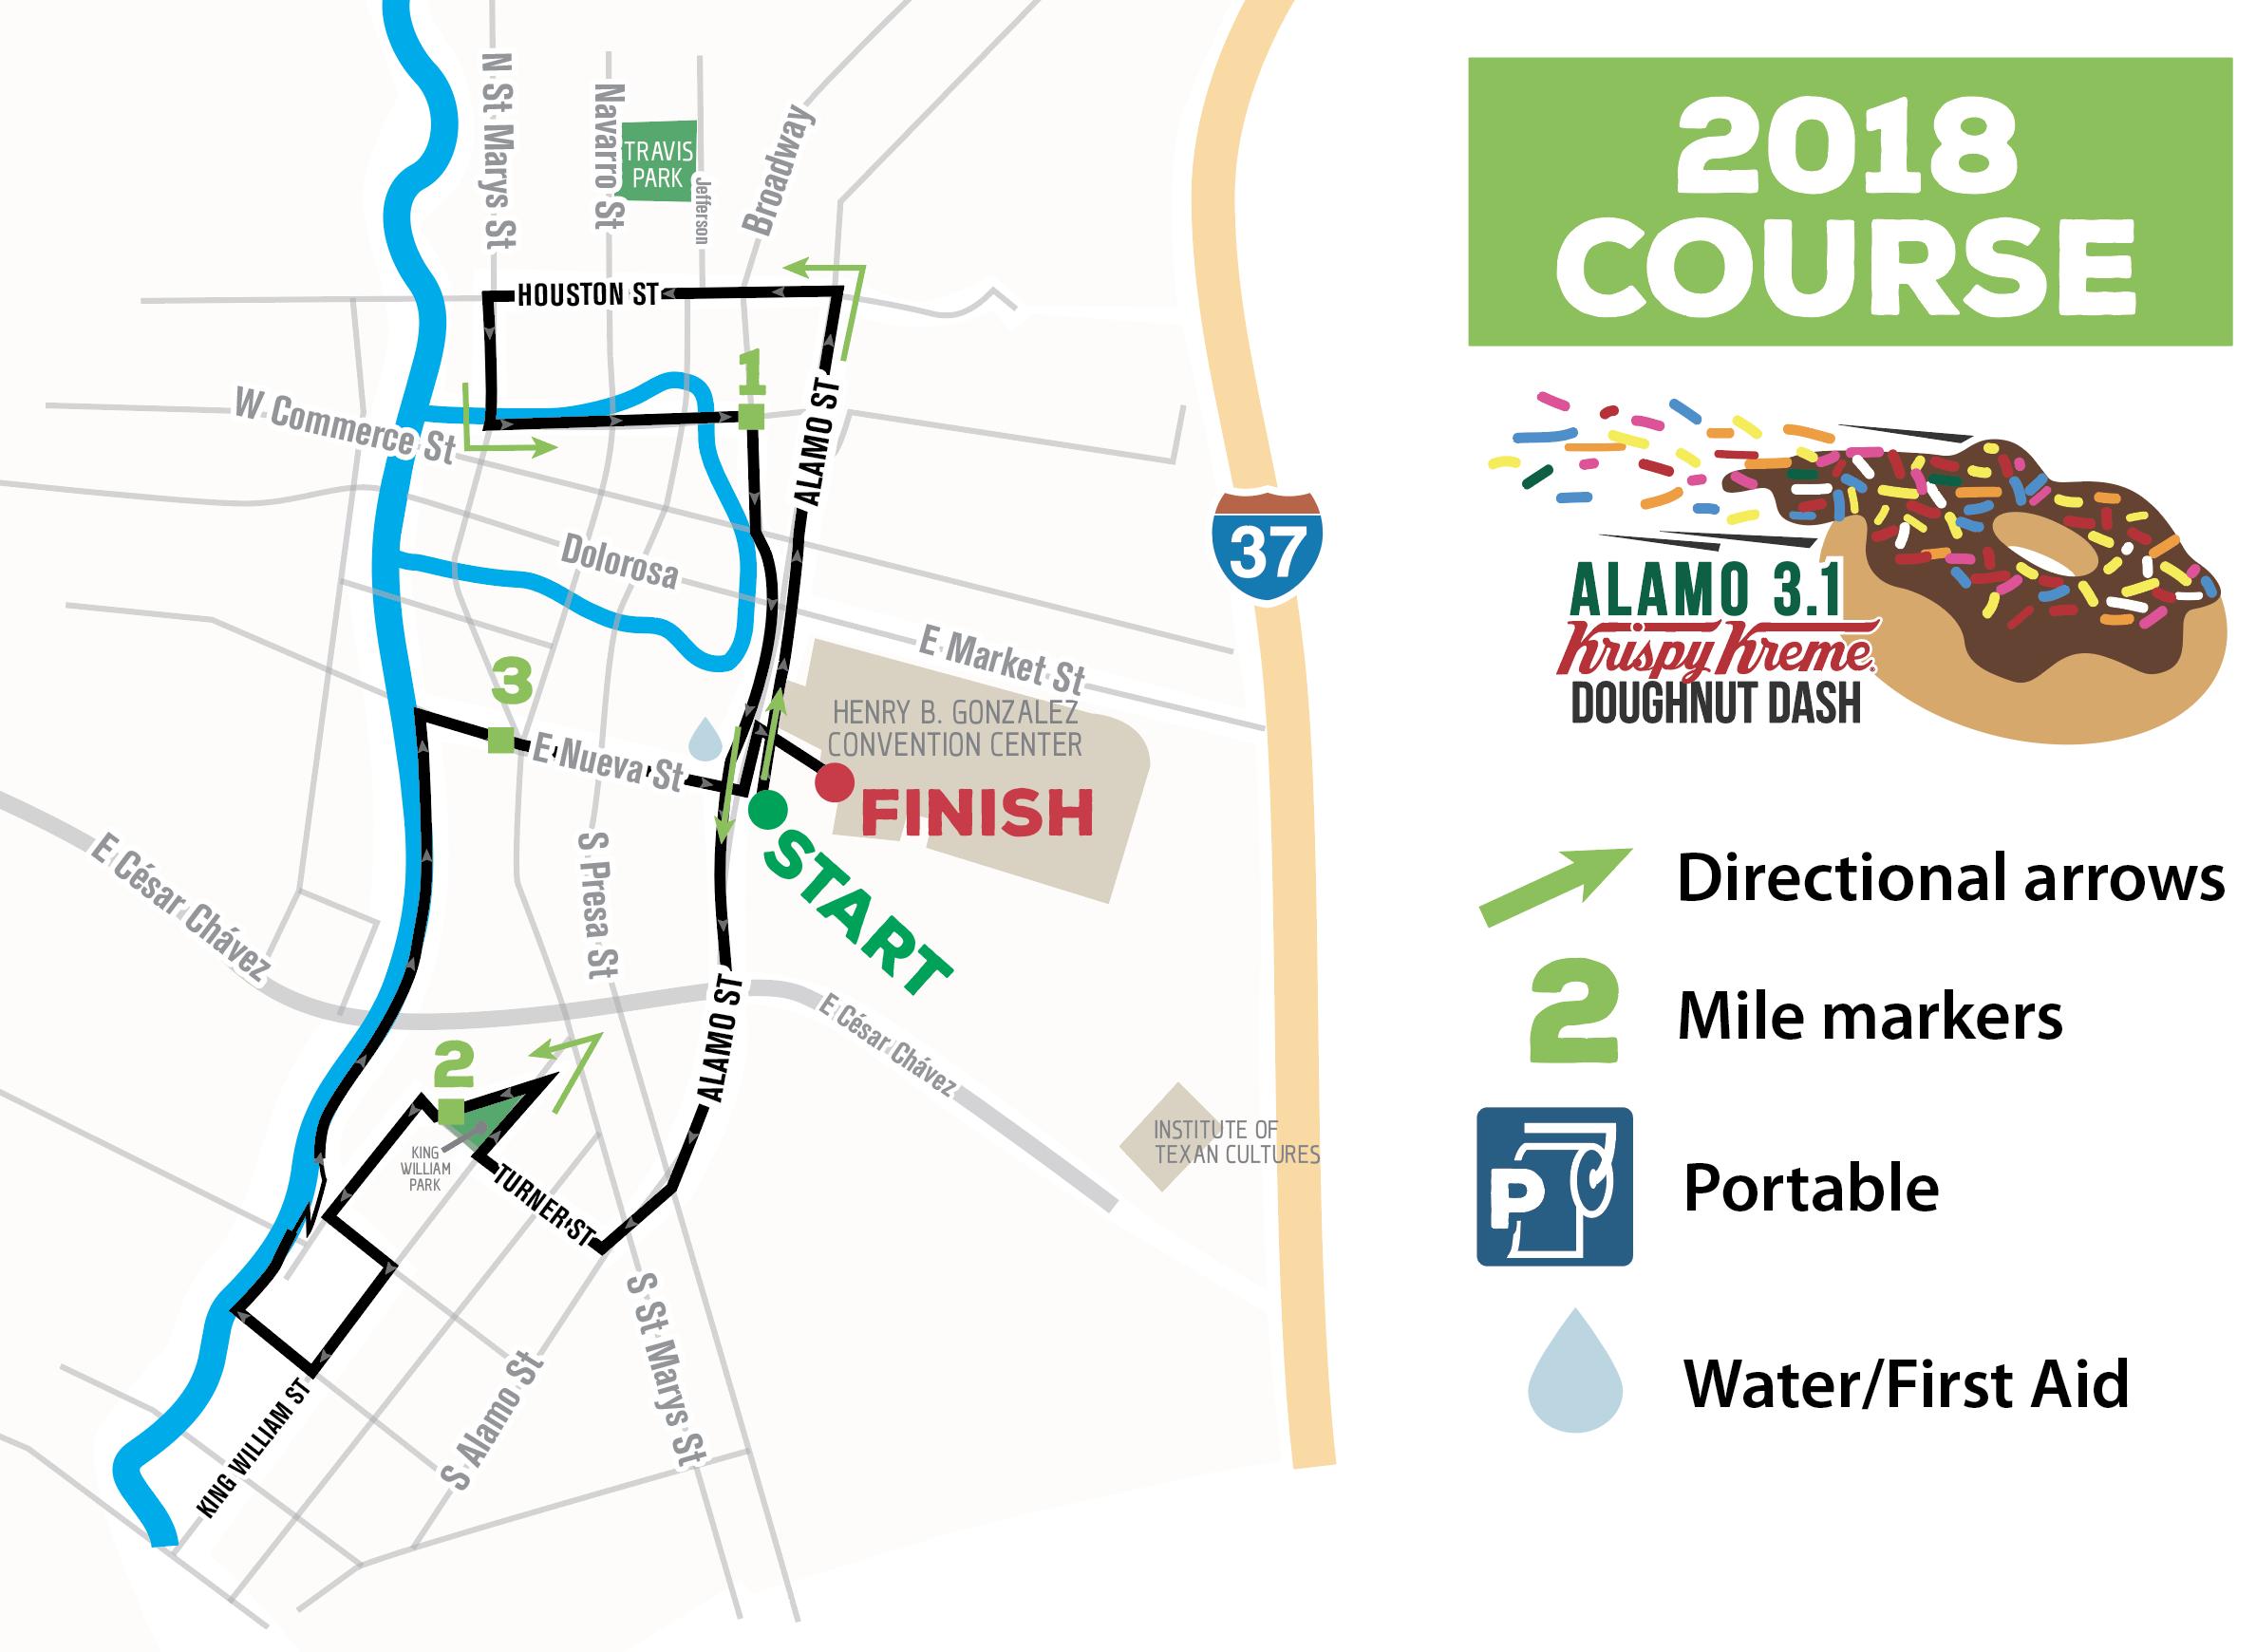 Alamo 3.1 course map